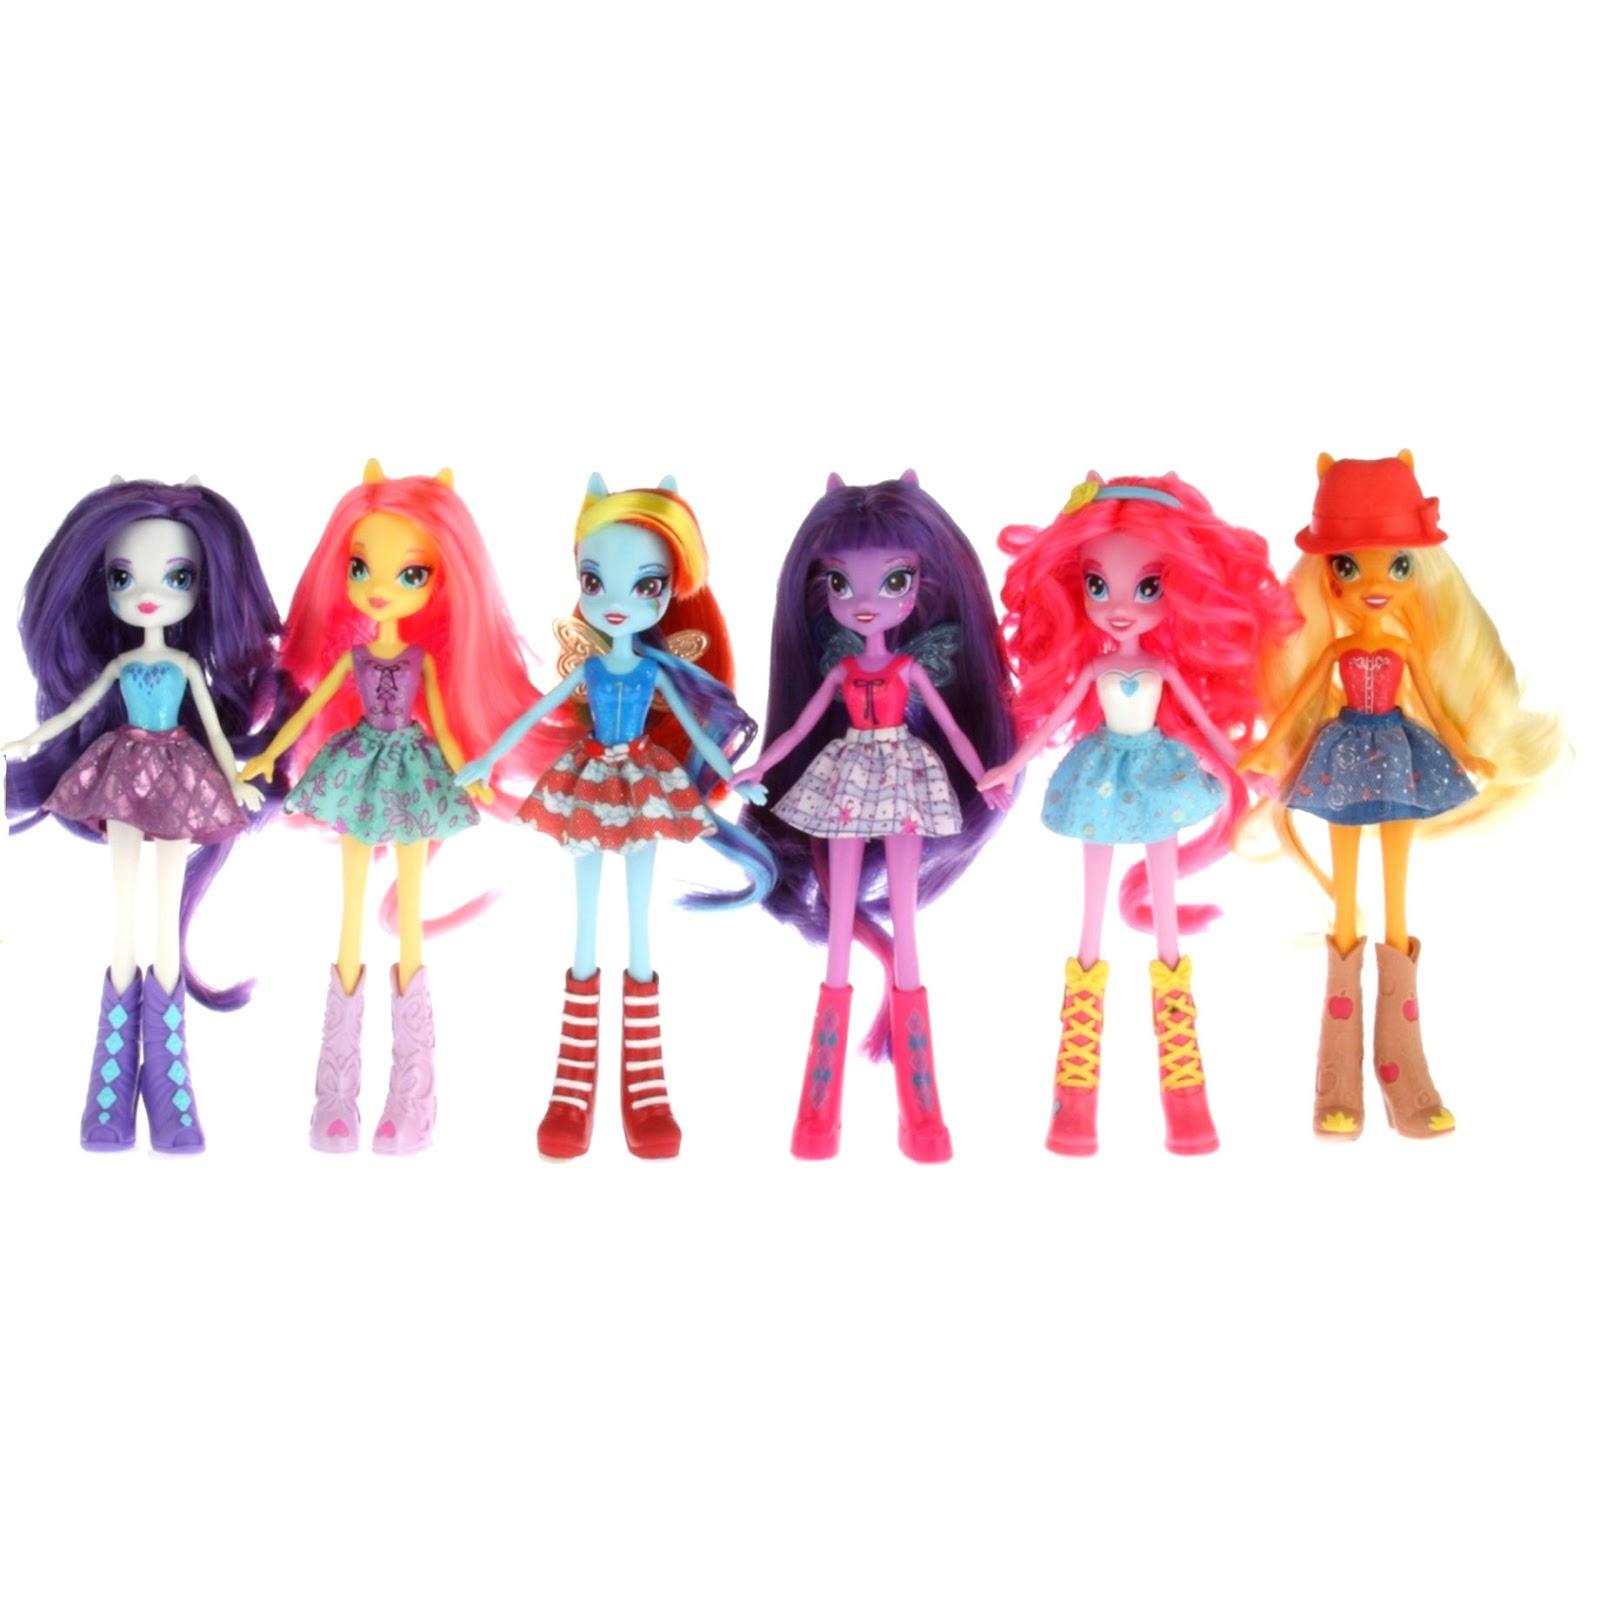 My Little Pony's Equestria Girls Finalized Dolls Revealed ...